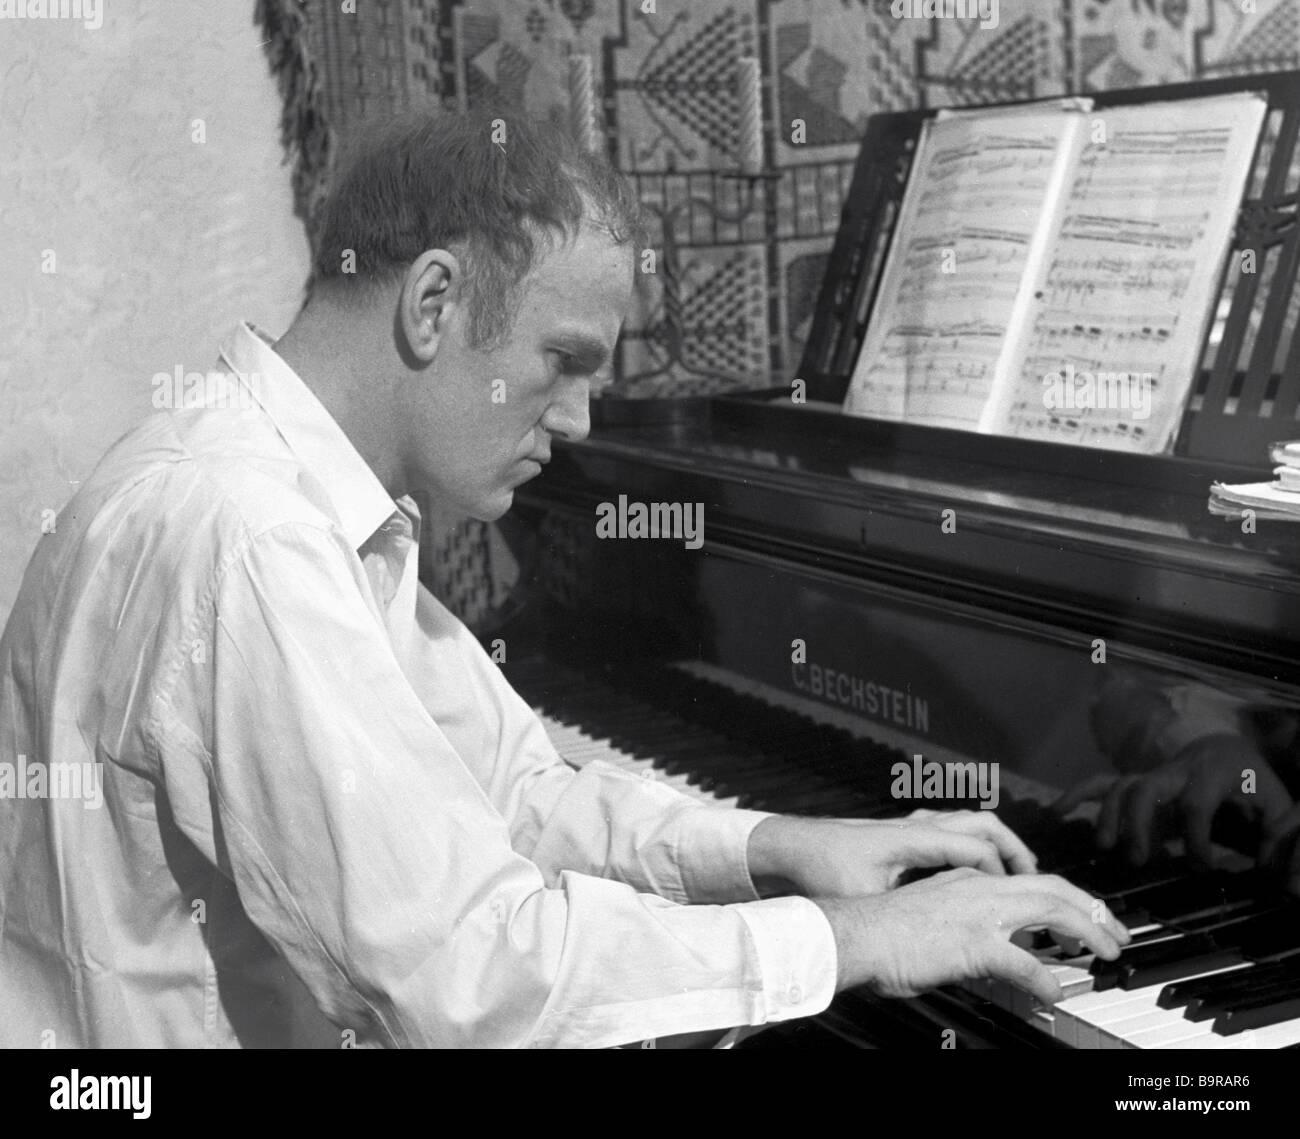 Pianist Concert Stock Photos & Pianist Concert Stock Images - Alamy